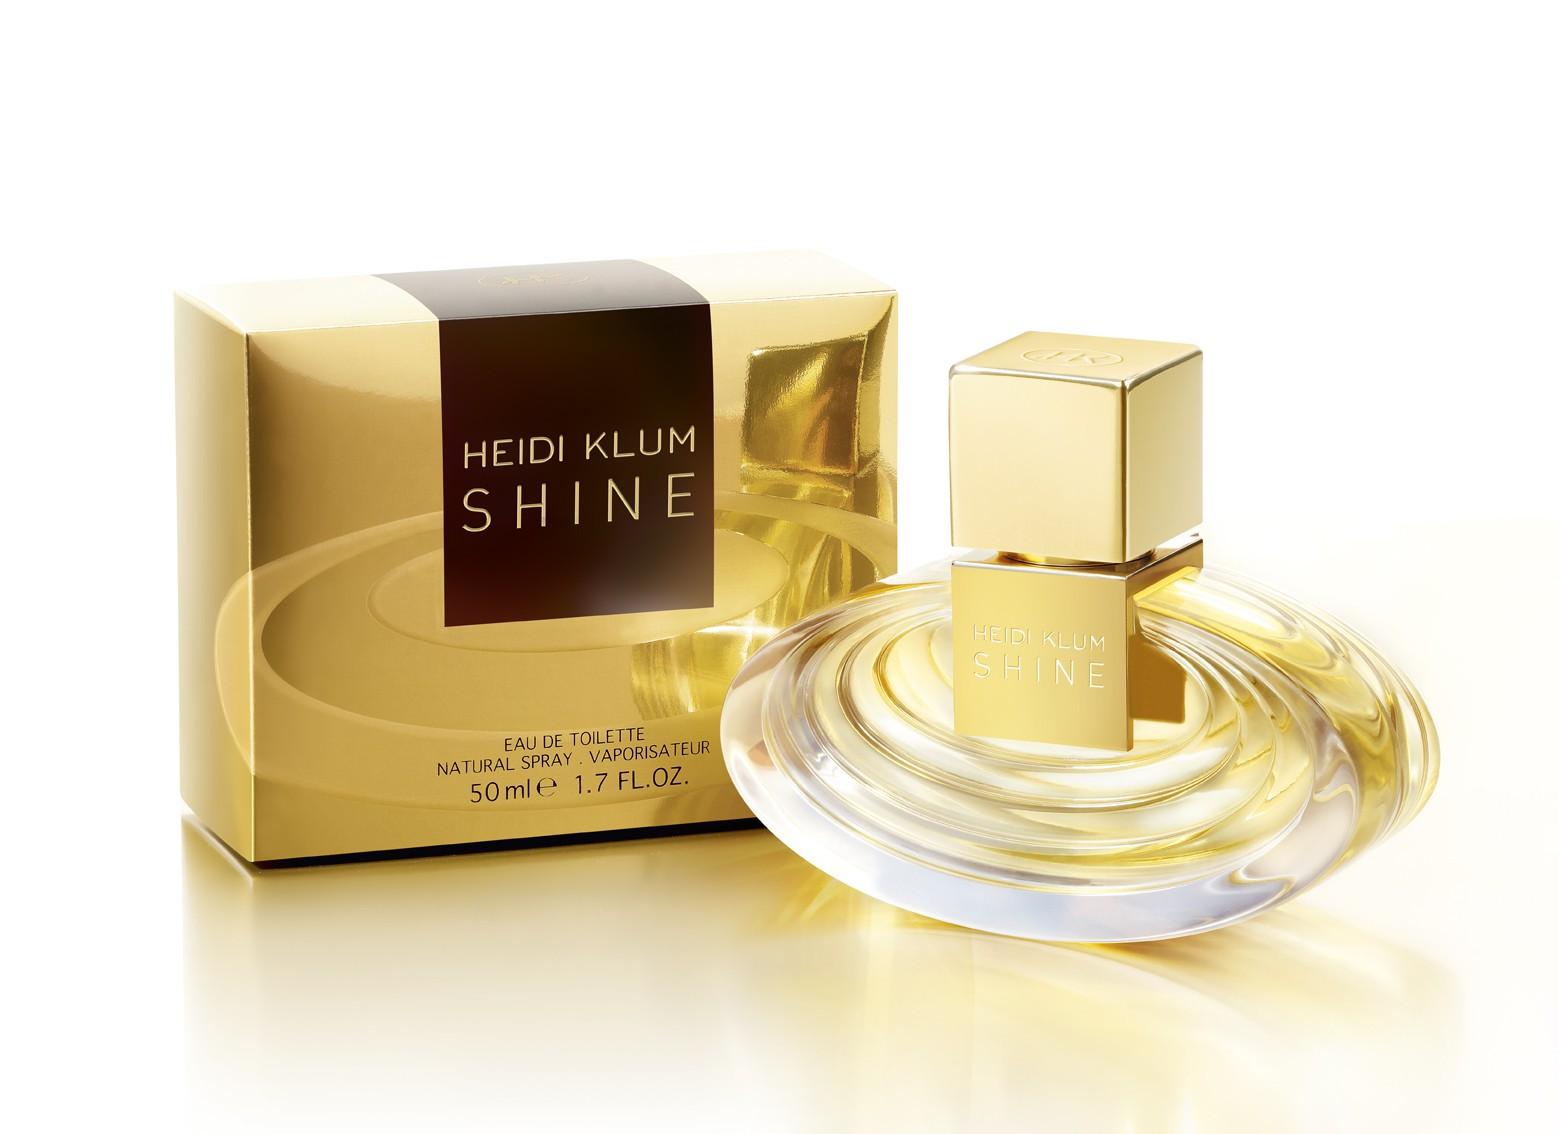 Heidi Klum Shine аромат для женщин